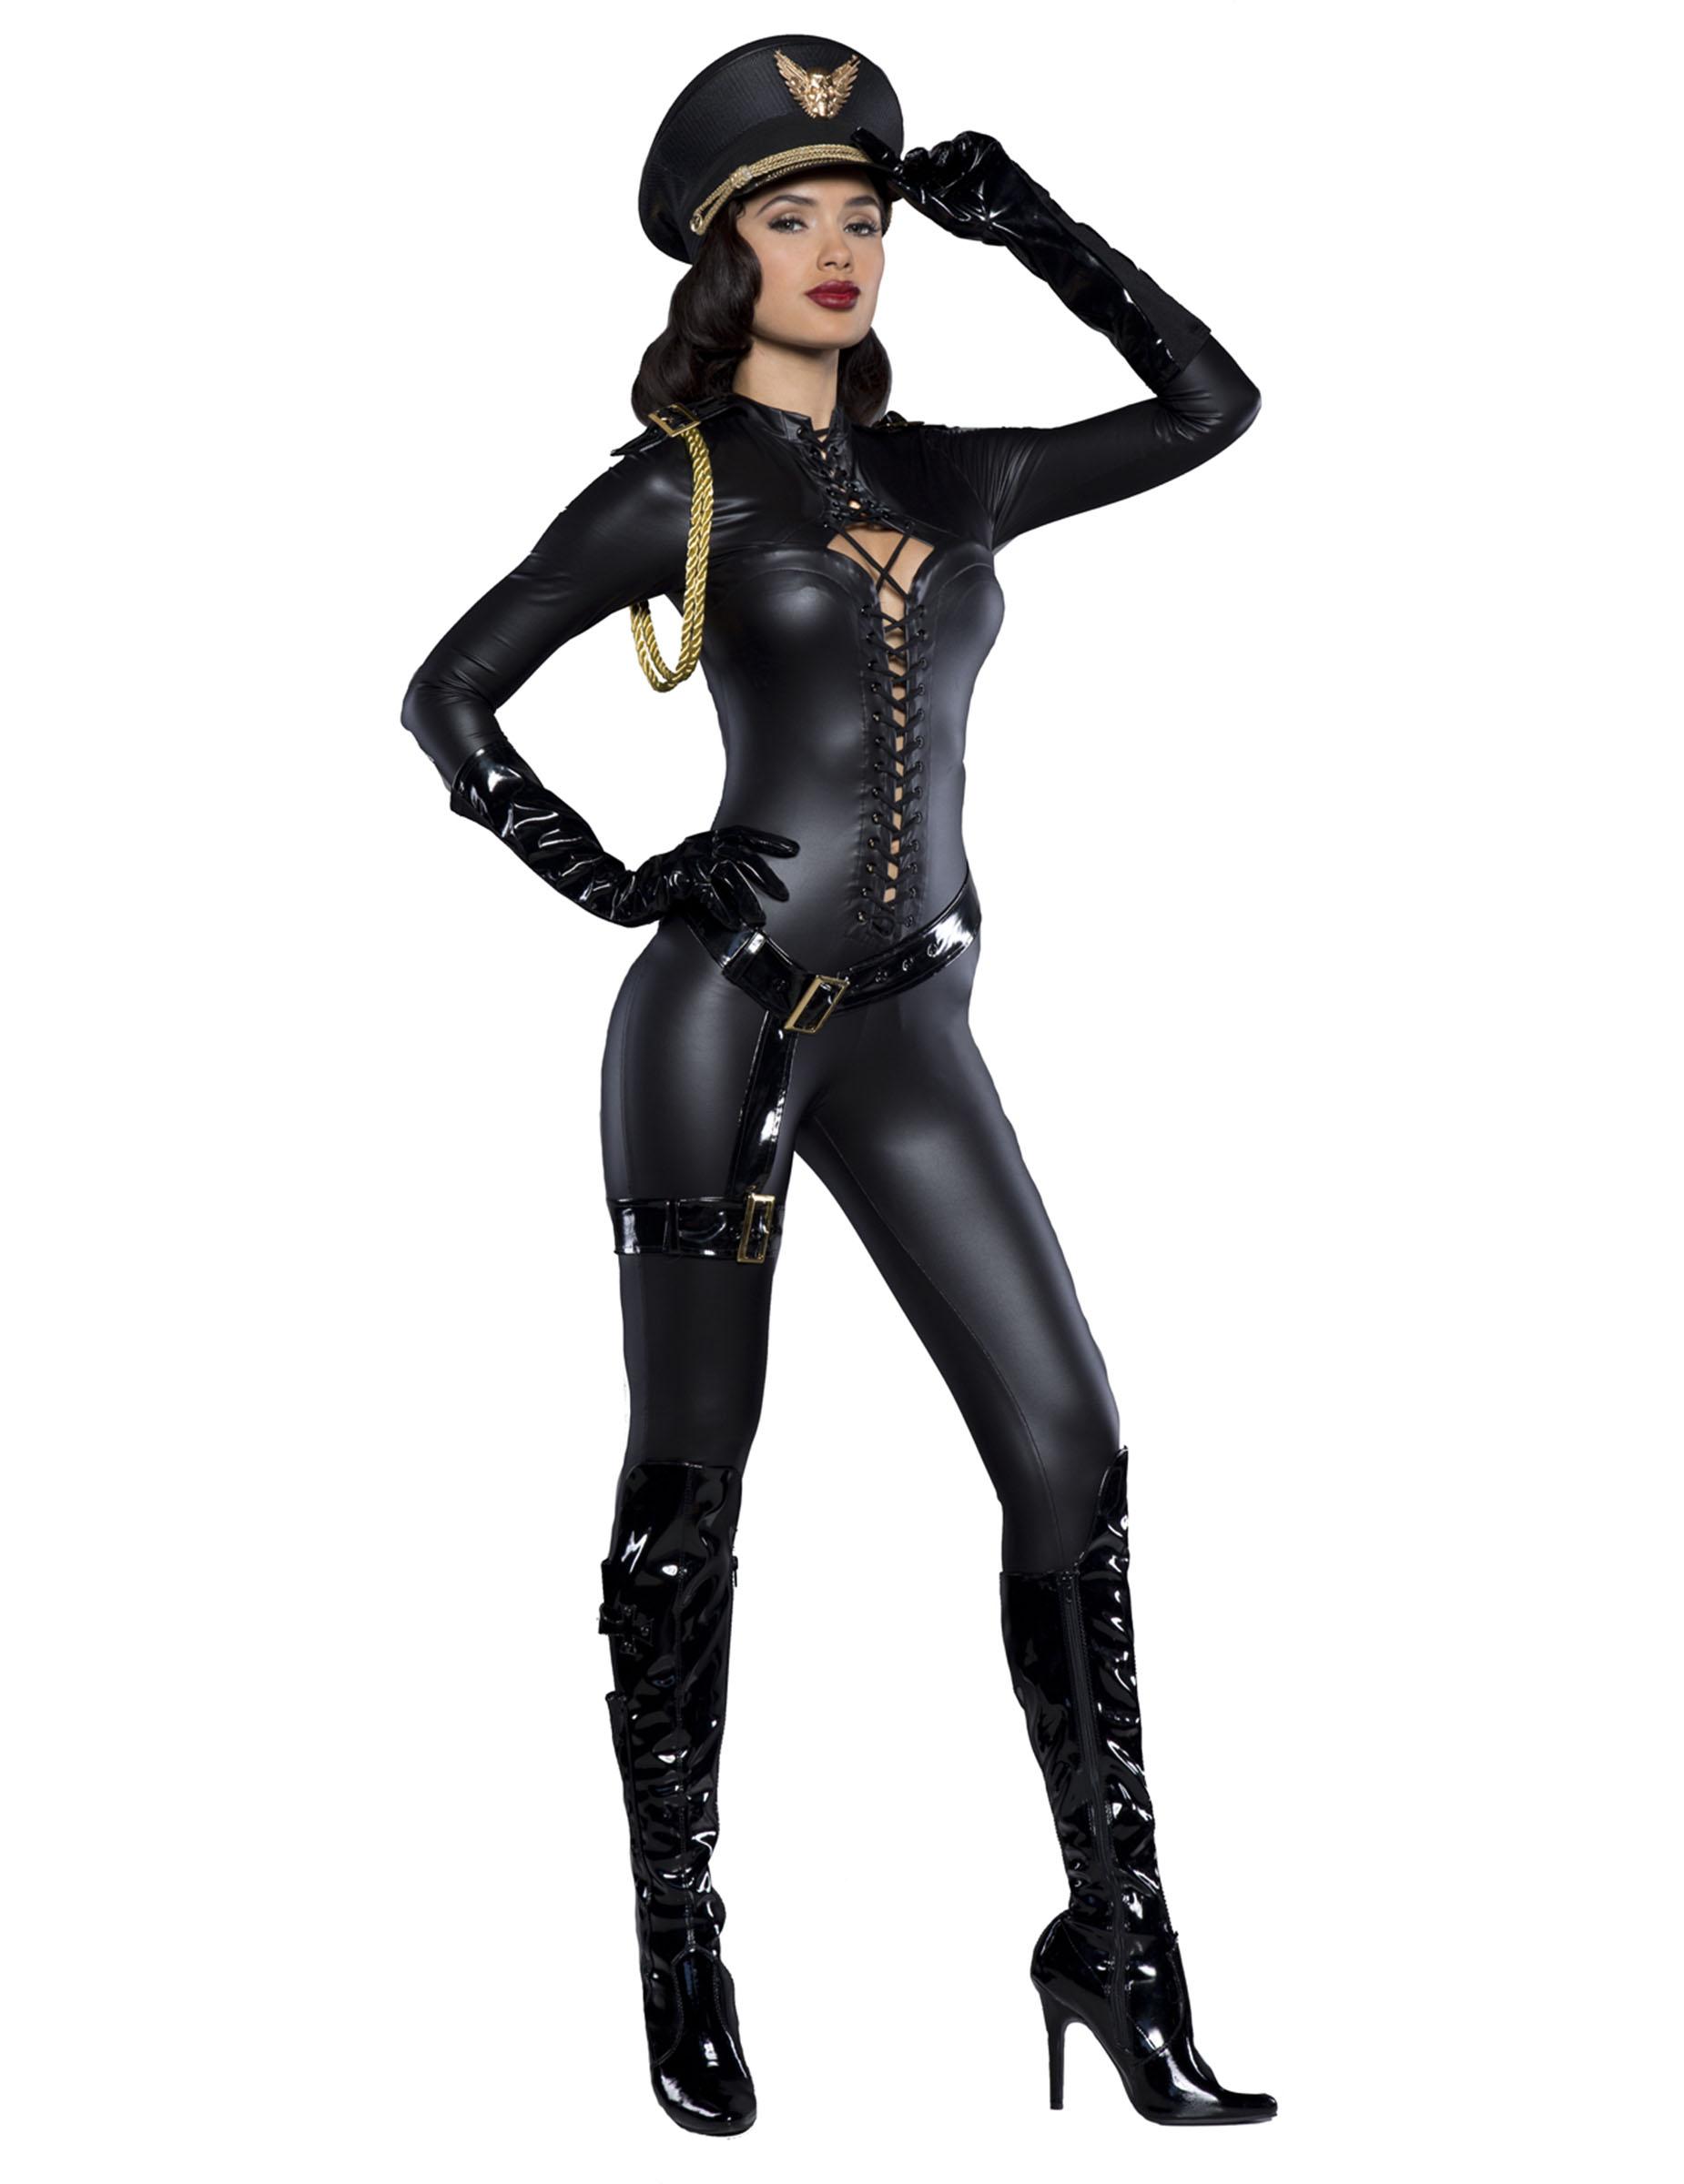 Carnavalskleding Marine Dames.Luxe Premium Sexy Kapitein Carnavalskleding Voor Dames Vegaoo Nl